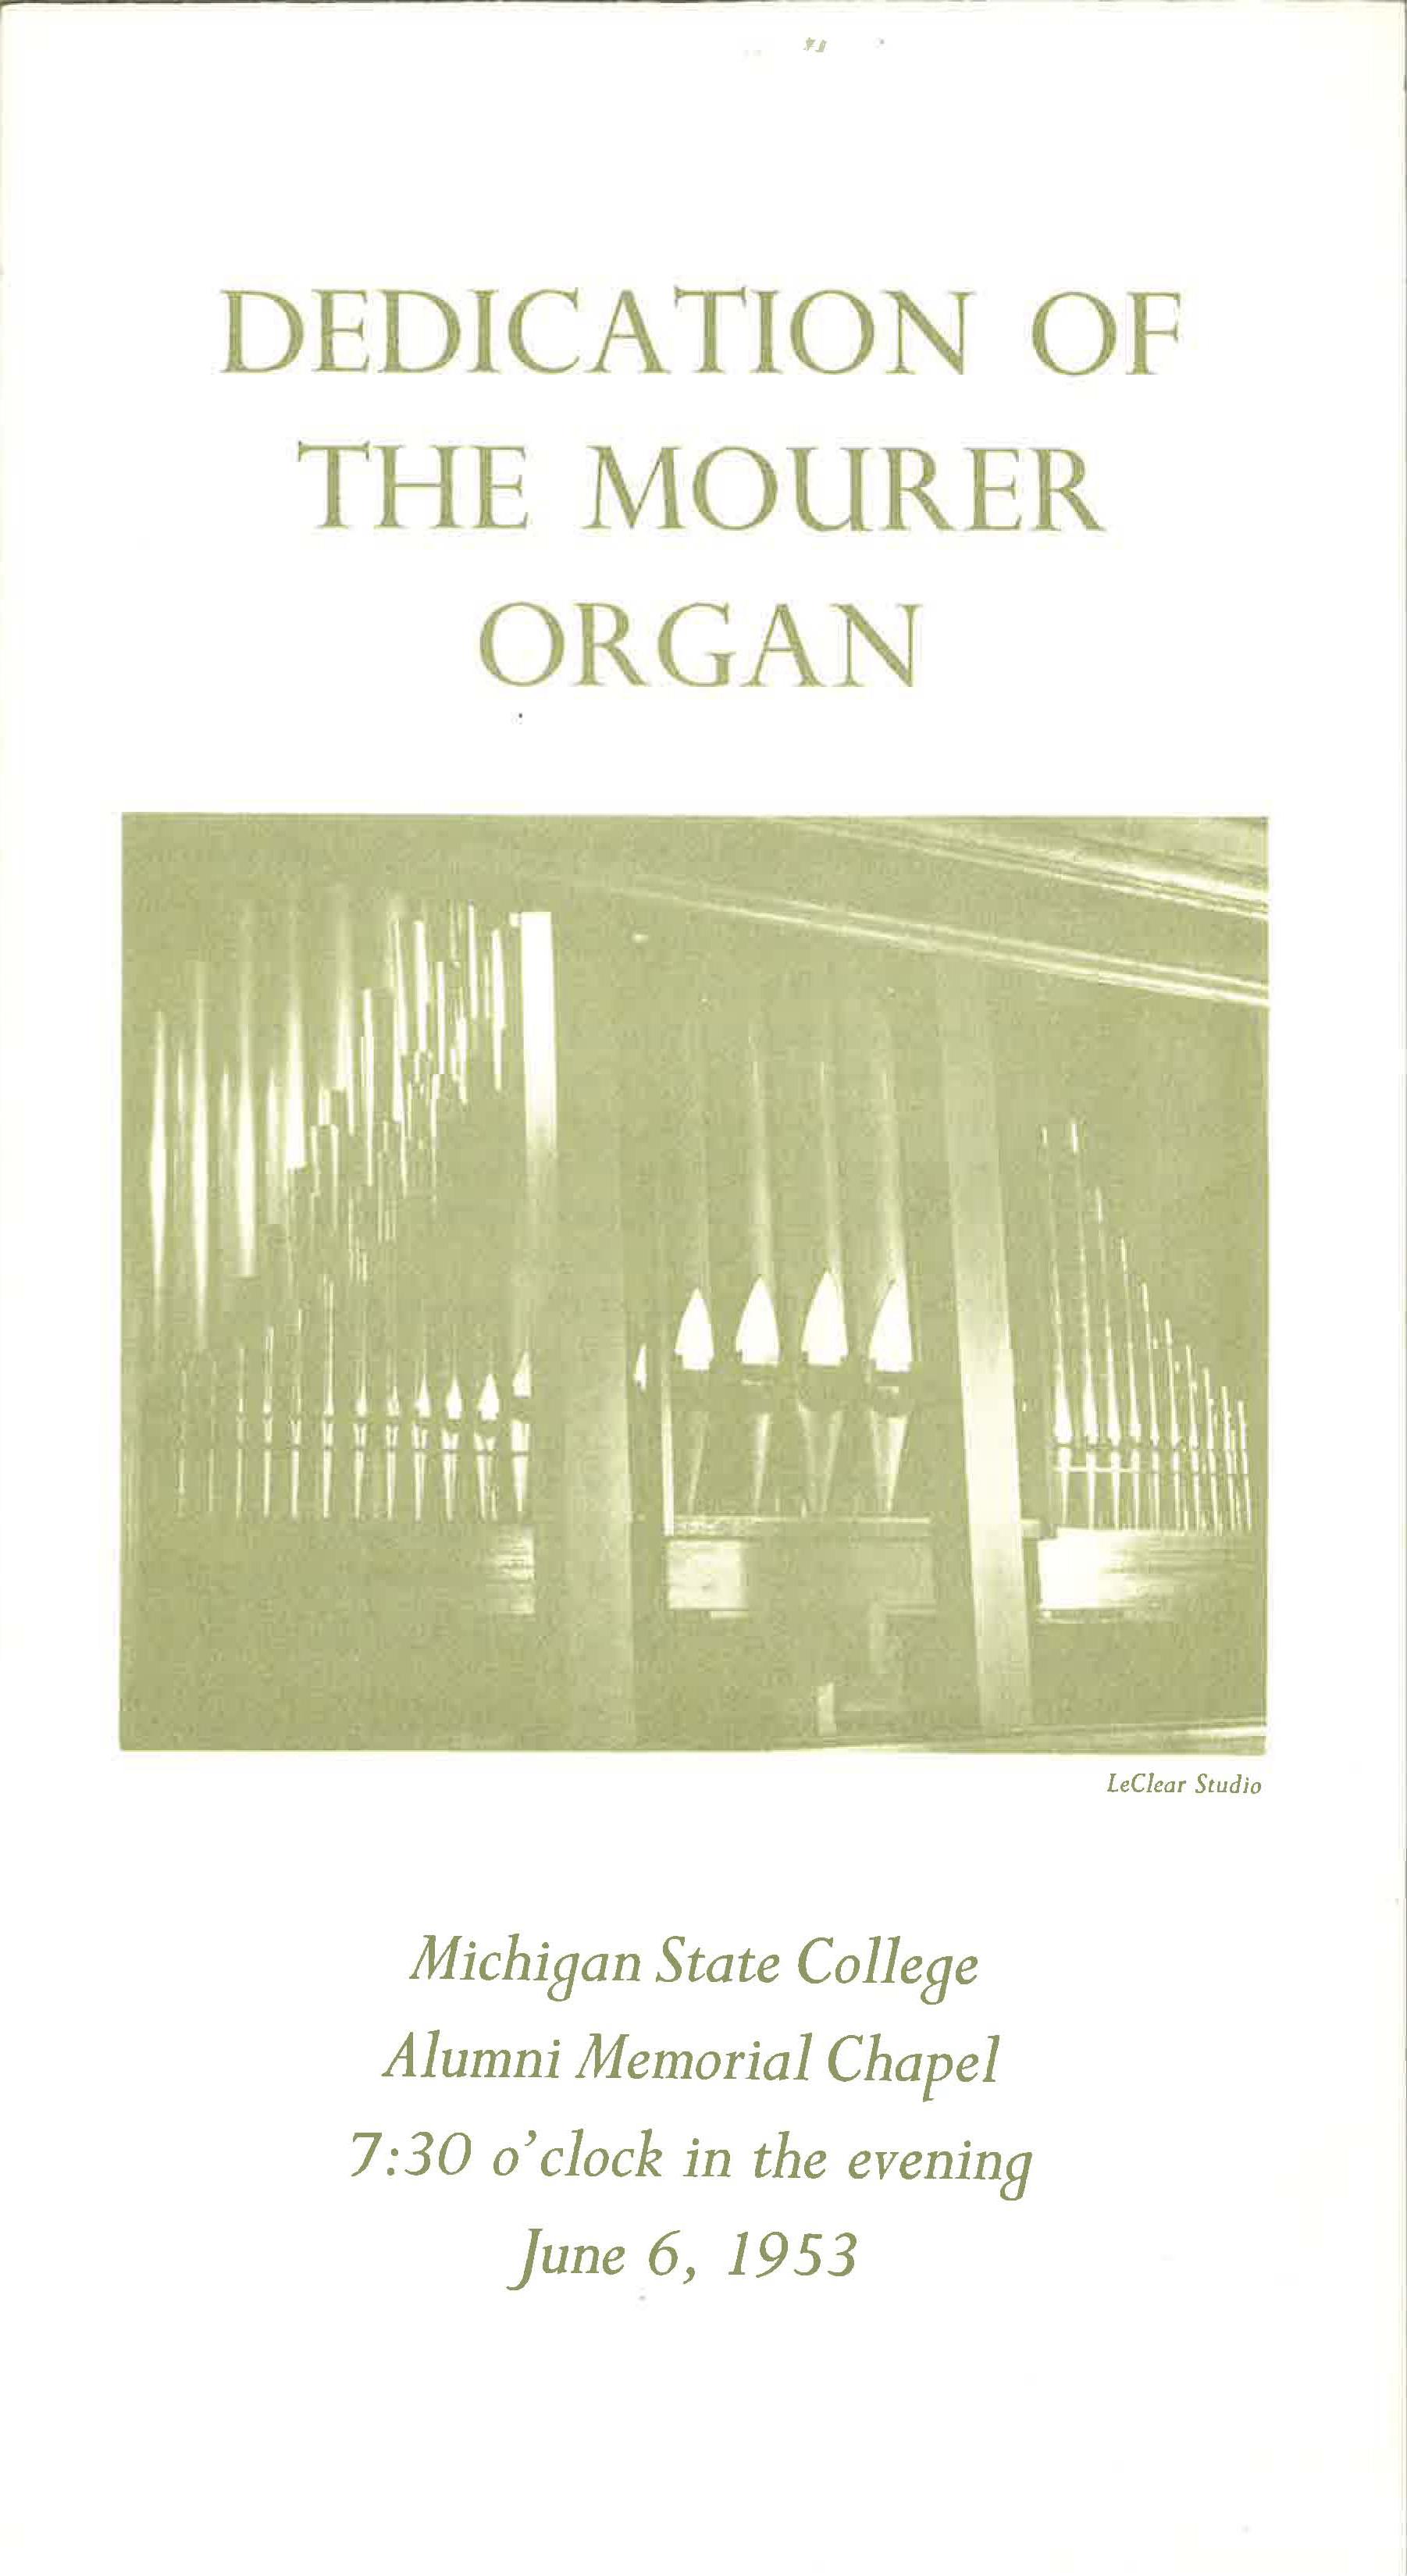 Dedication of the Mourer Organ; June 6, 1953